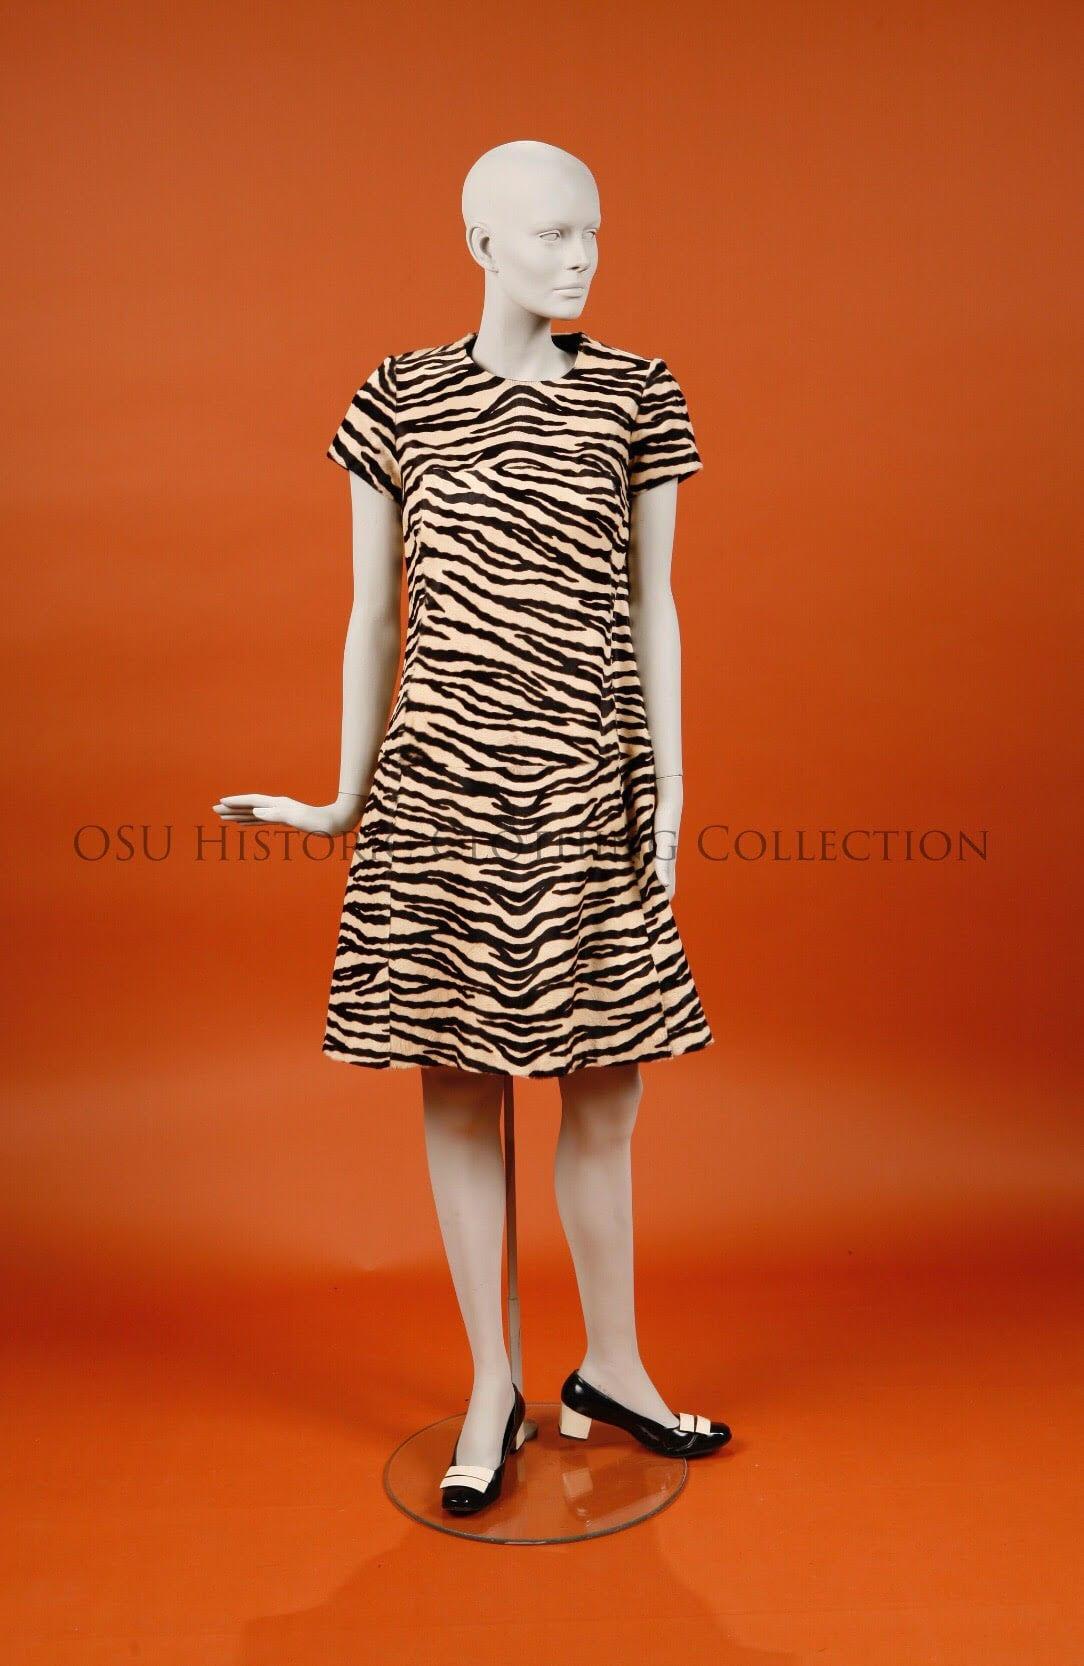 041c73813 Clothes Lines